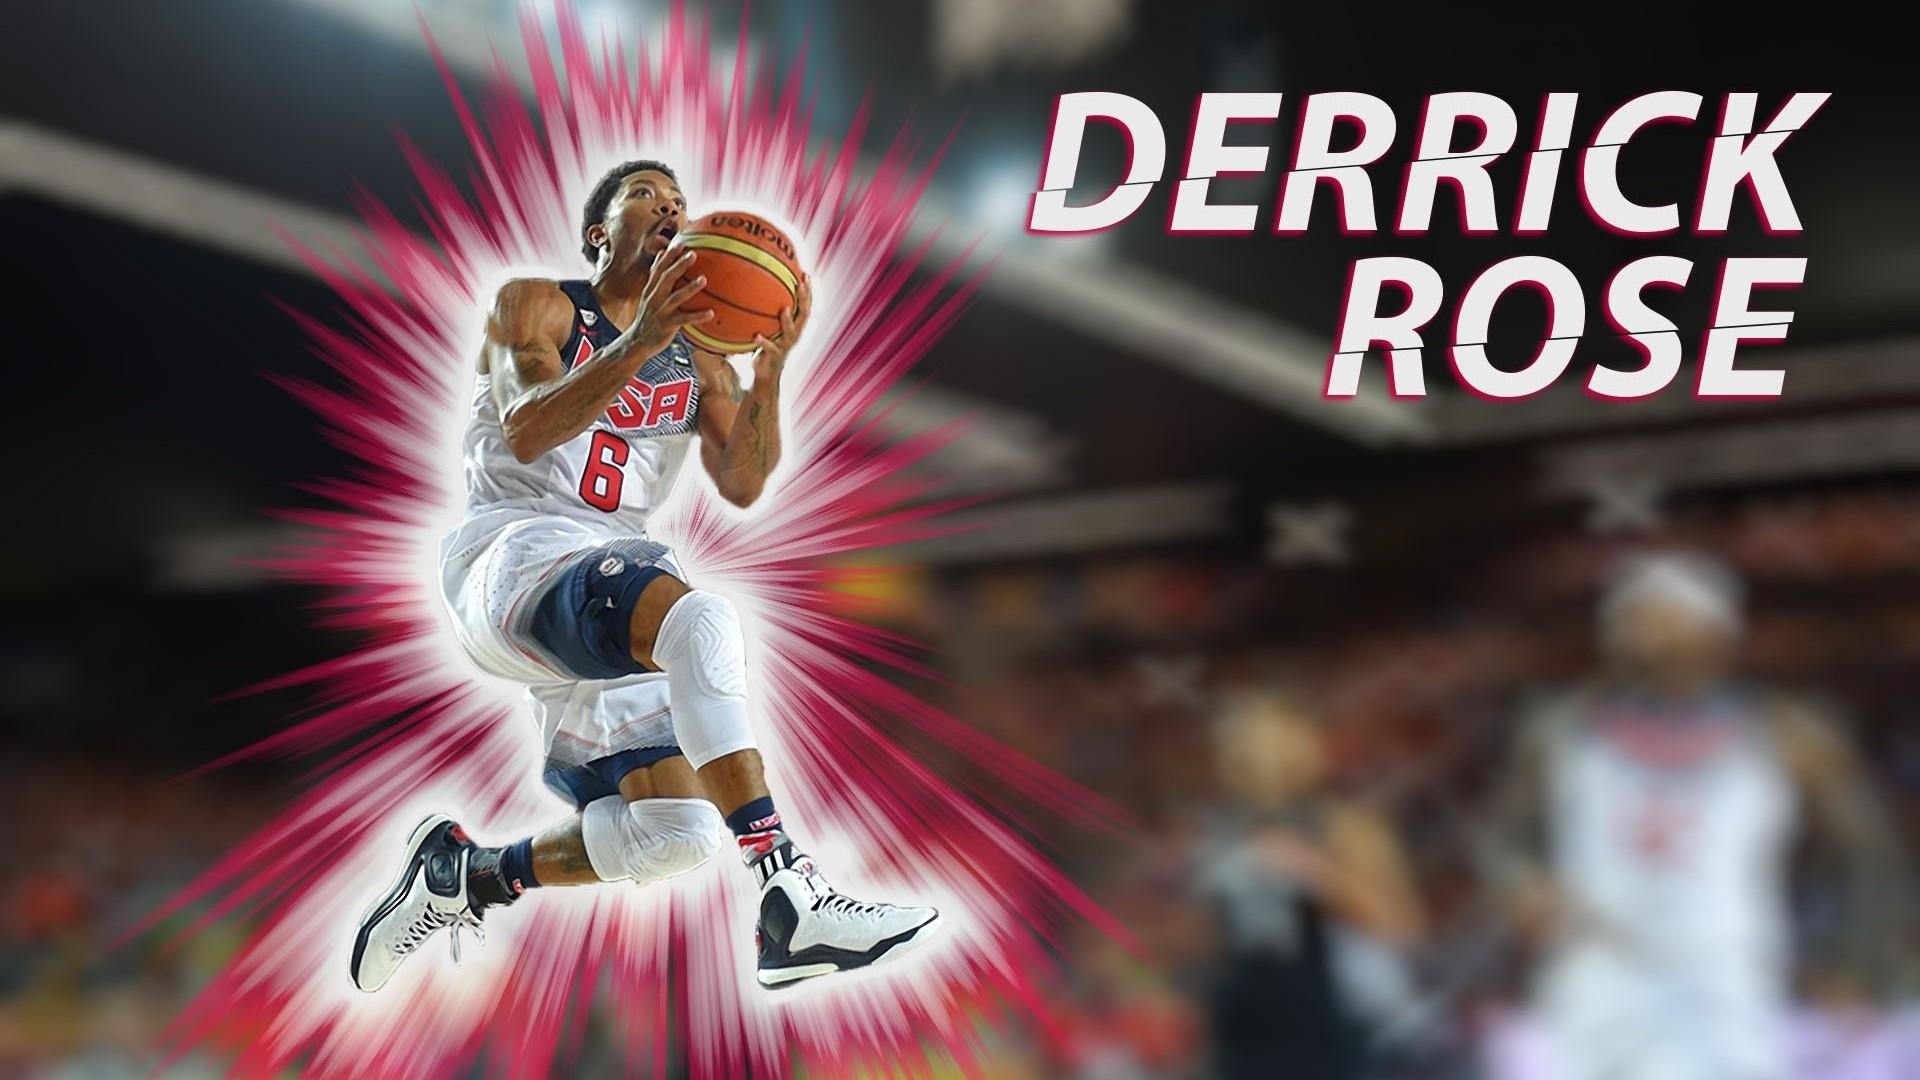 Derrick Rose HD Wallpaper